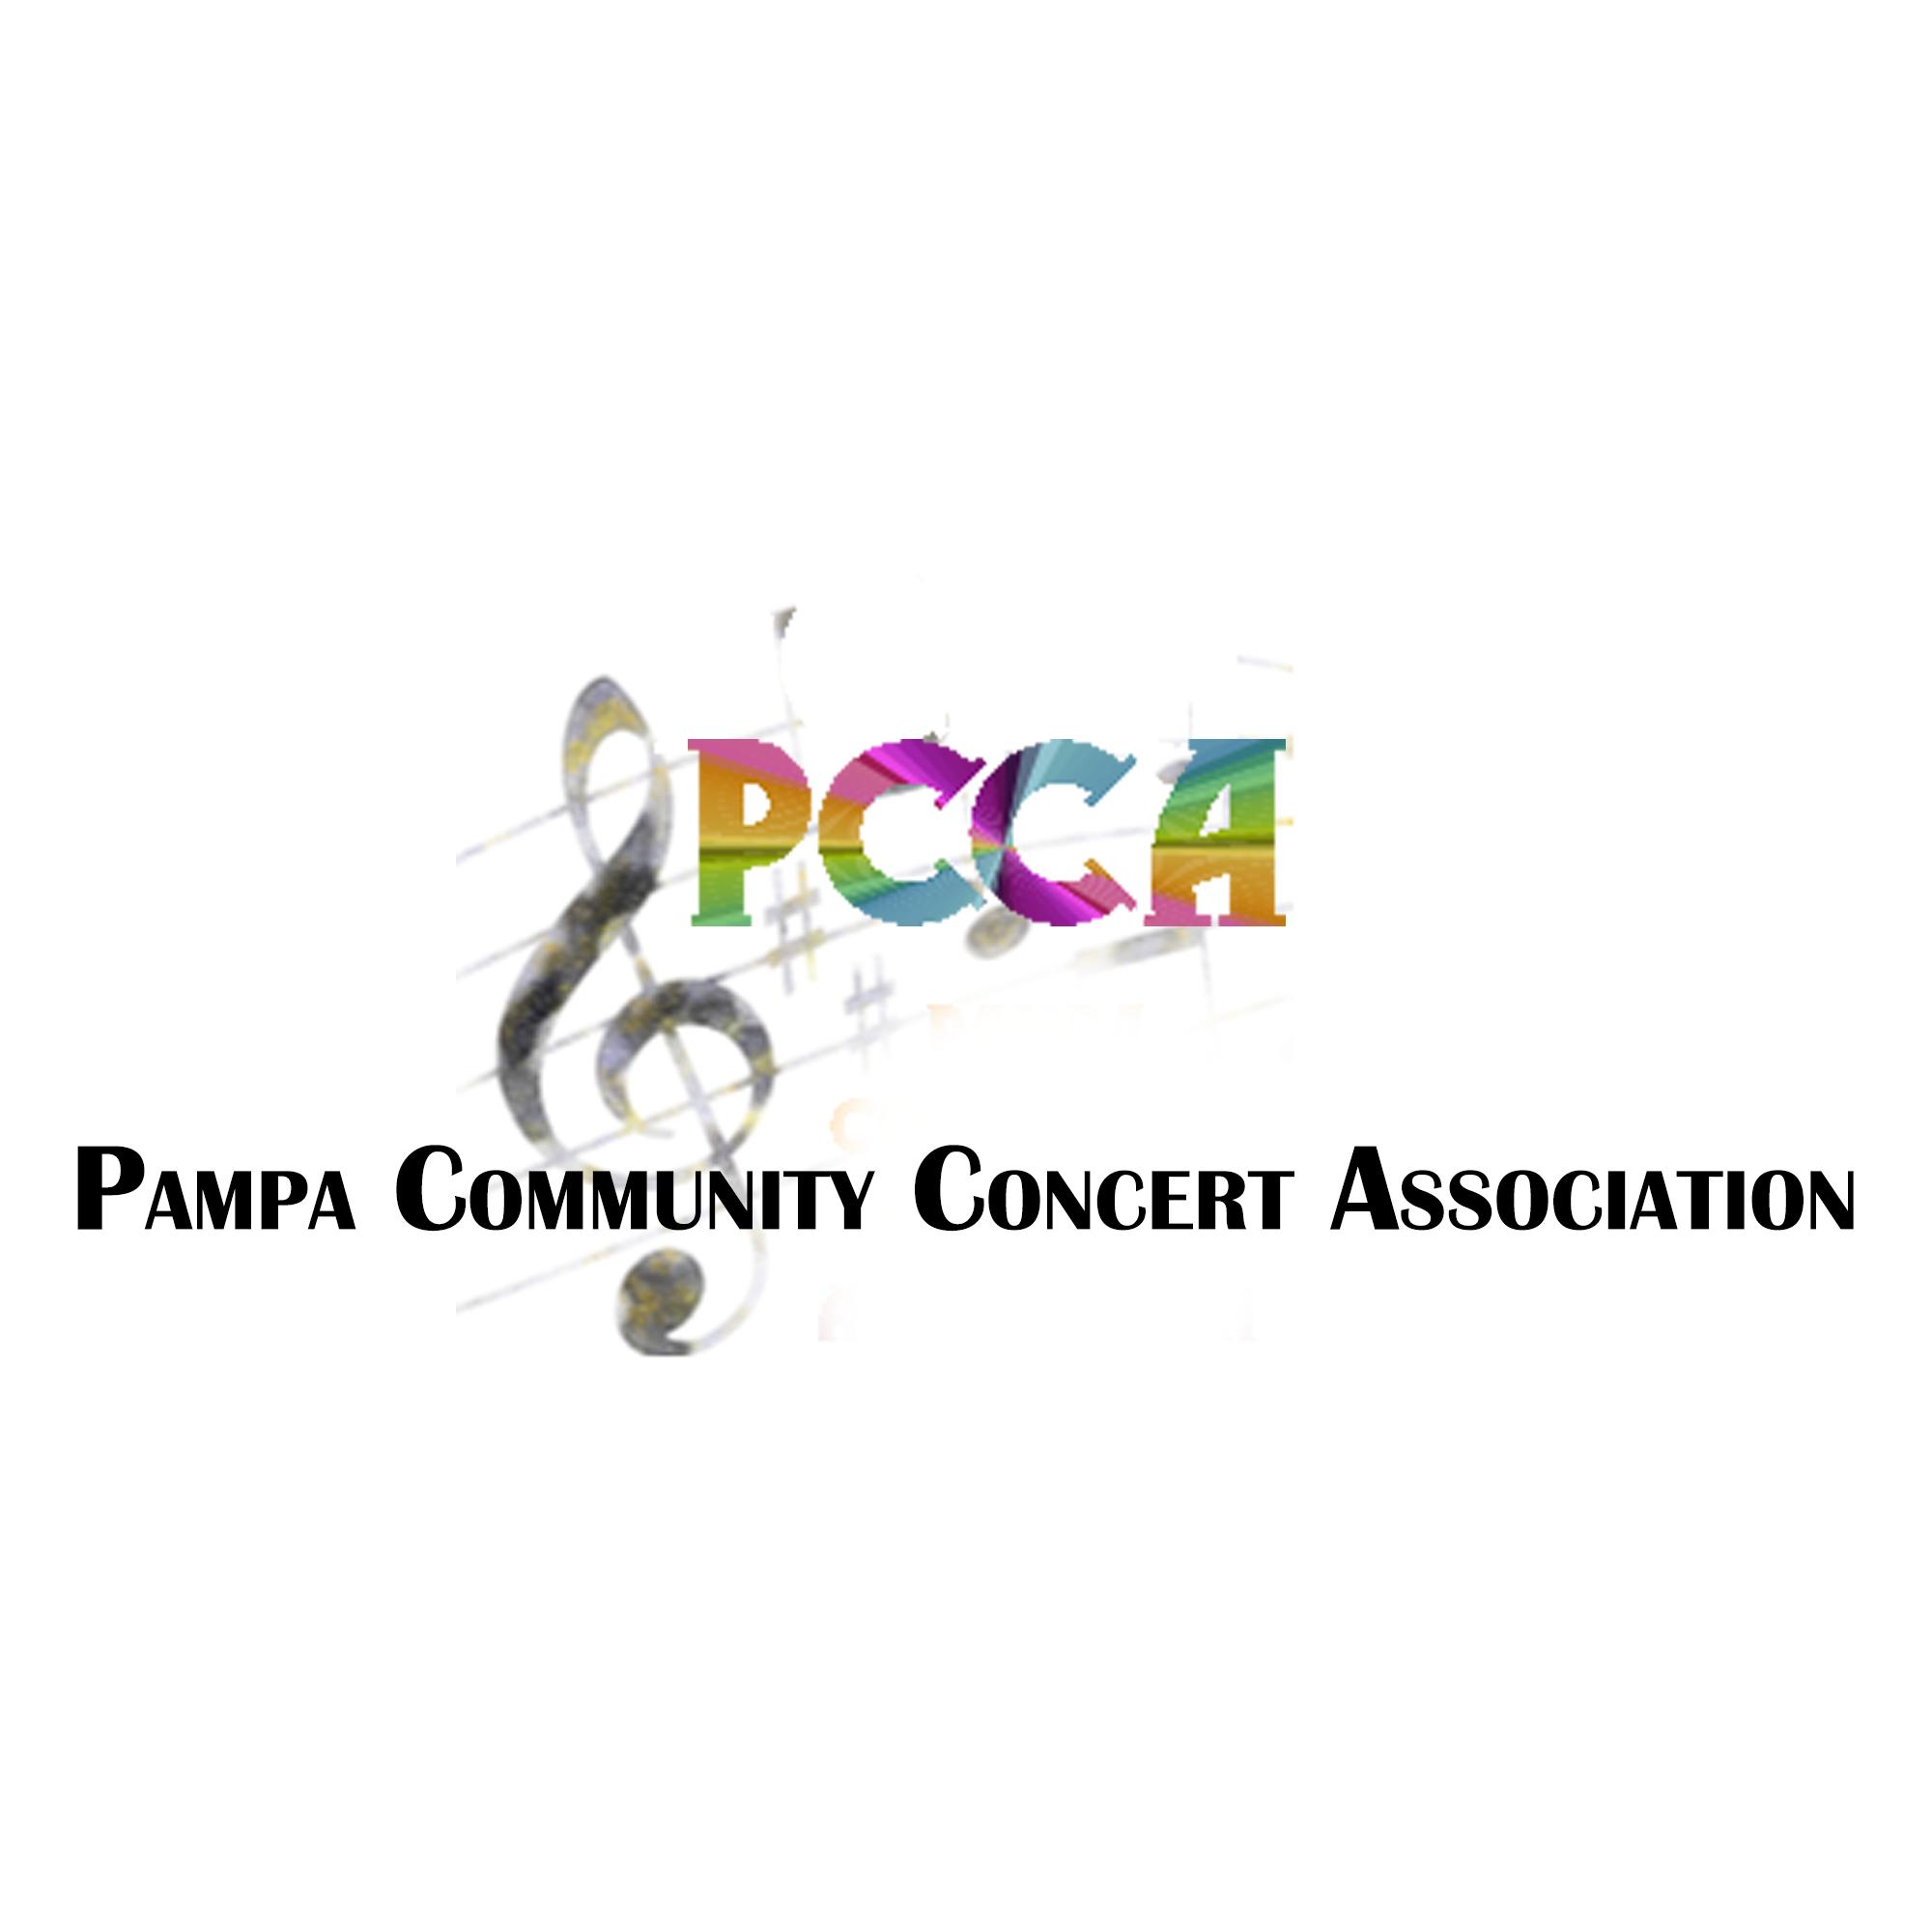 Pampa Community Concert Association